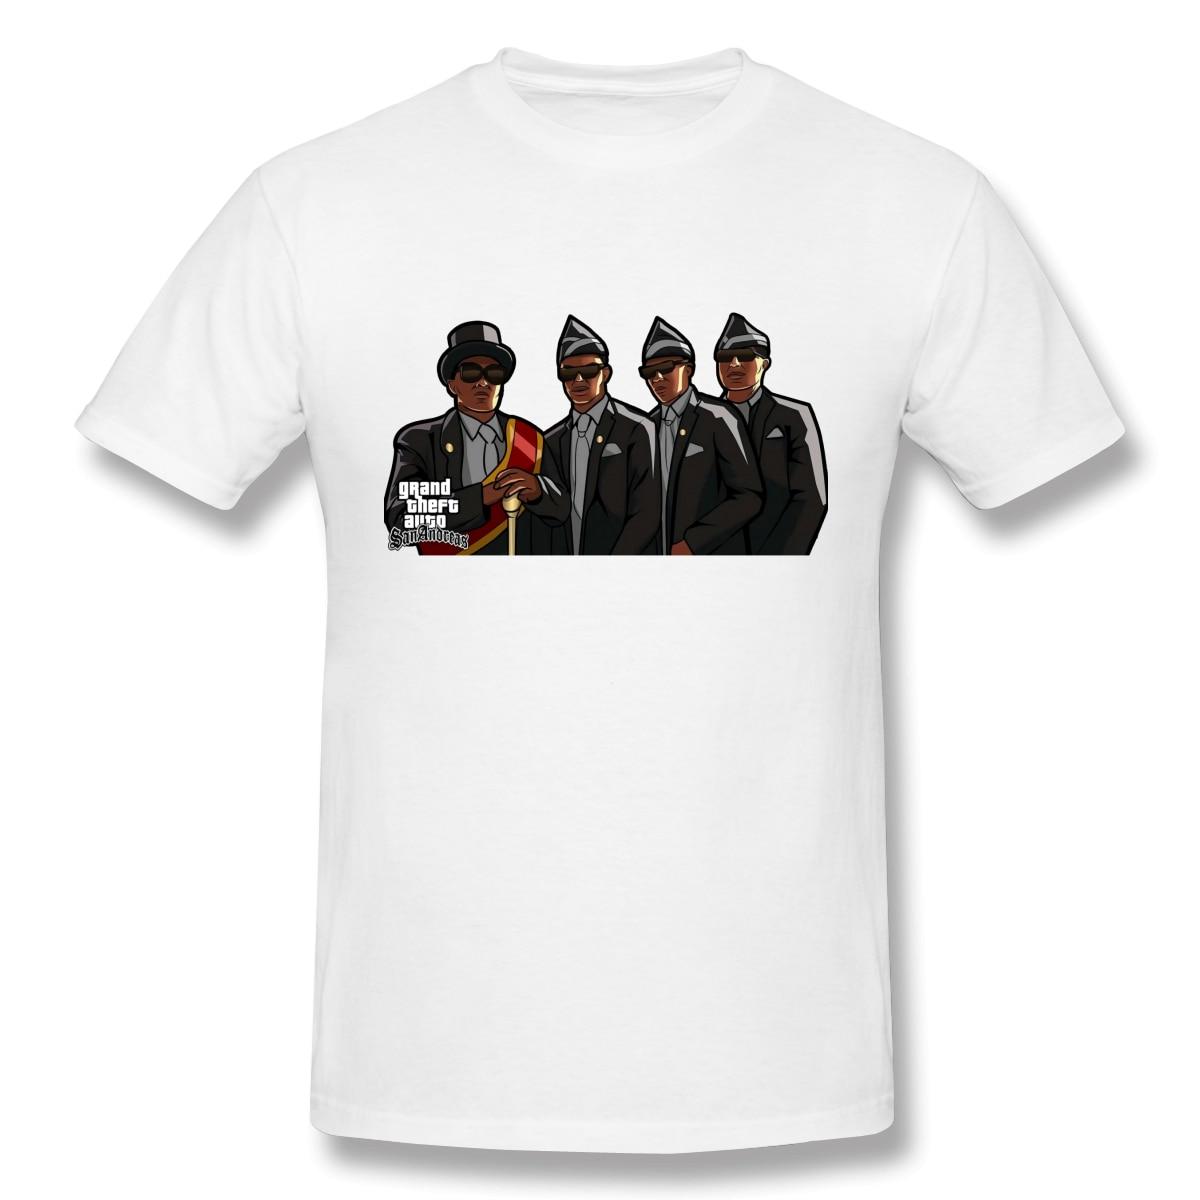 Coffin Dance Funeral Dance с шкатулкой Meme, Мужская футболка, повседневные мужские топы, Мужская одежда, уличная футболка, Мужская футболка, белая футбол...